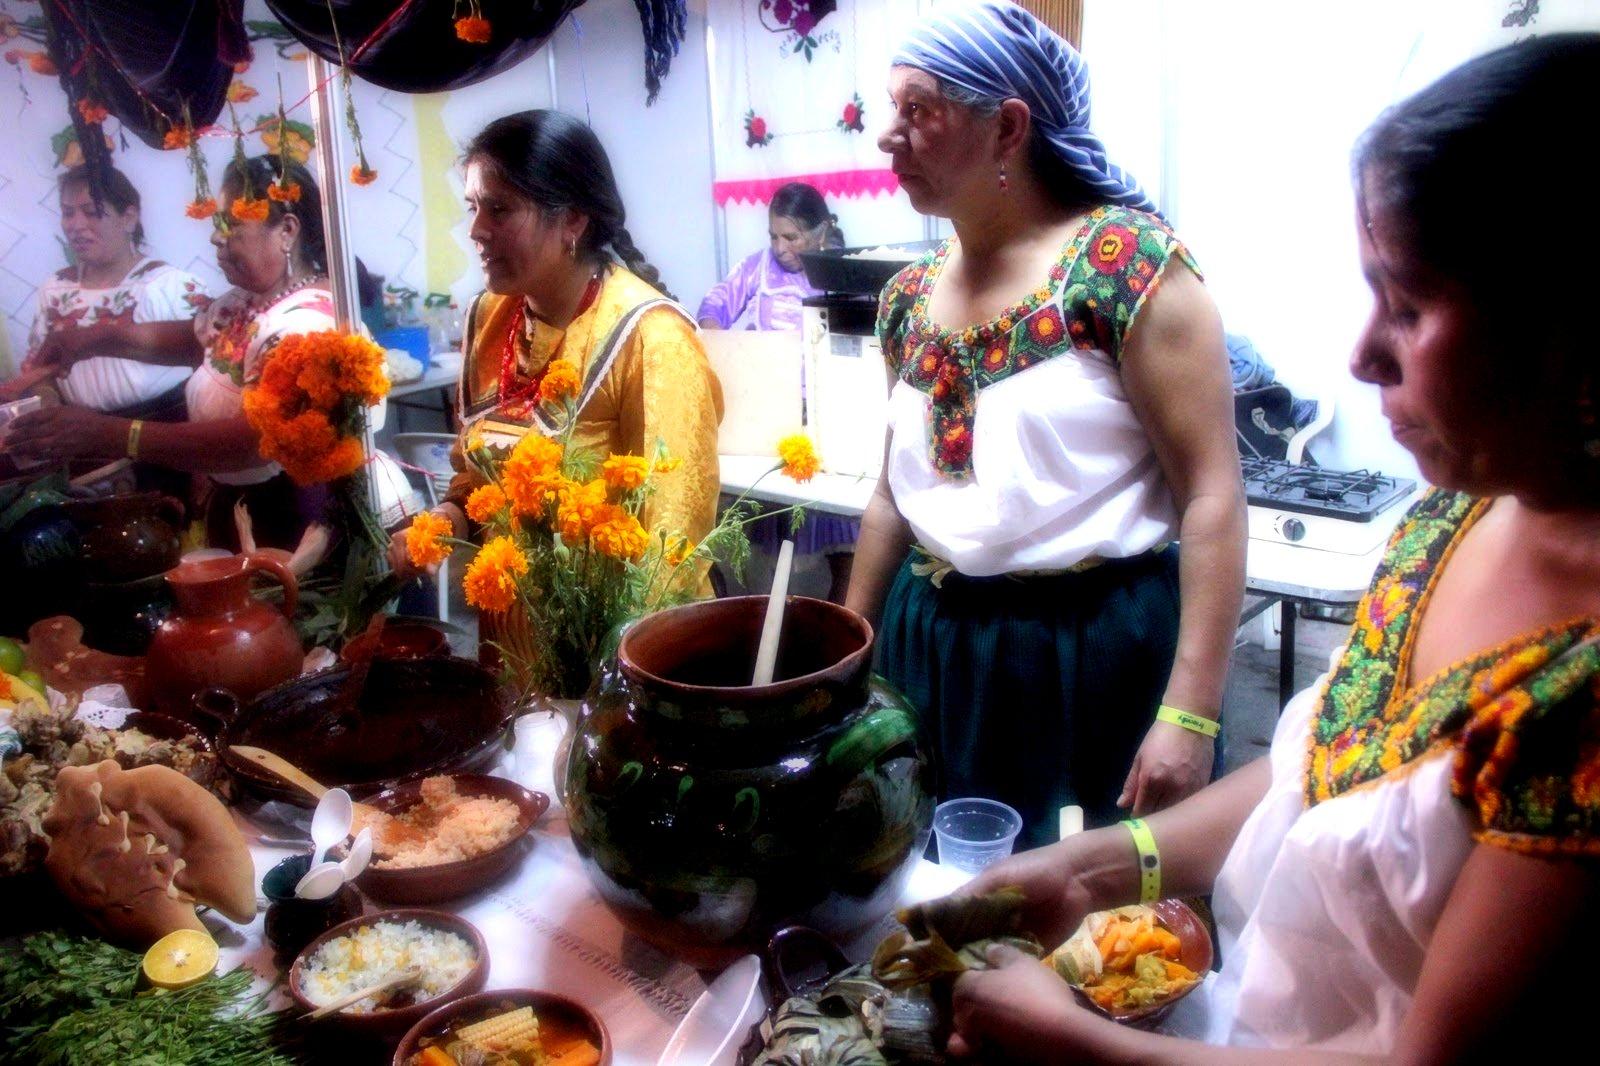 Comida mexicana tradicional y ancestral for Cocina tradicional